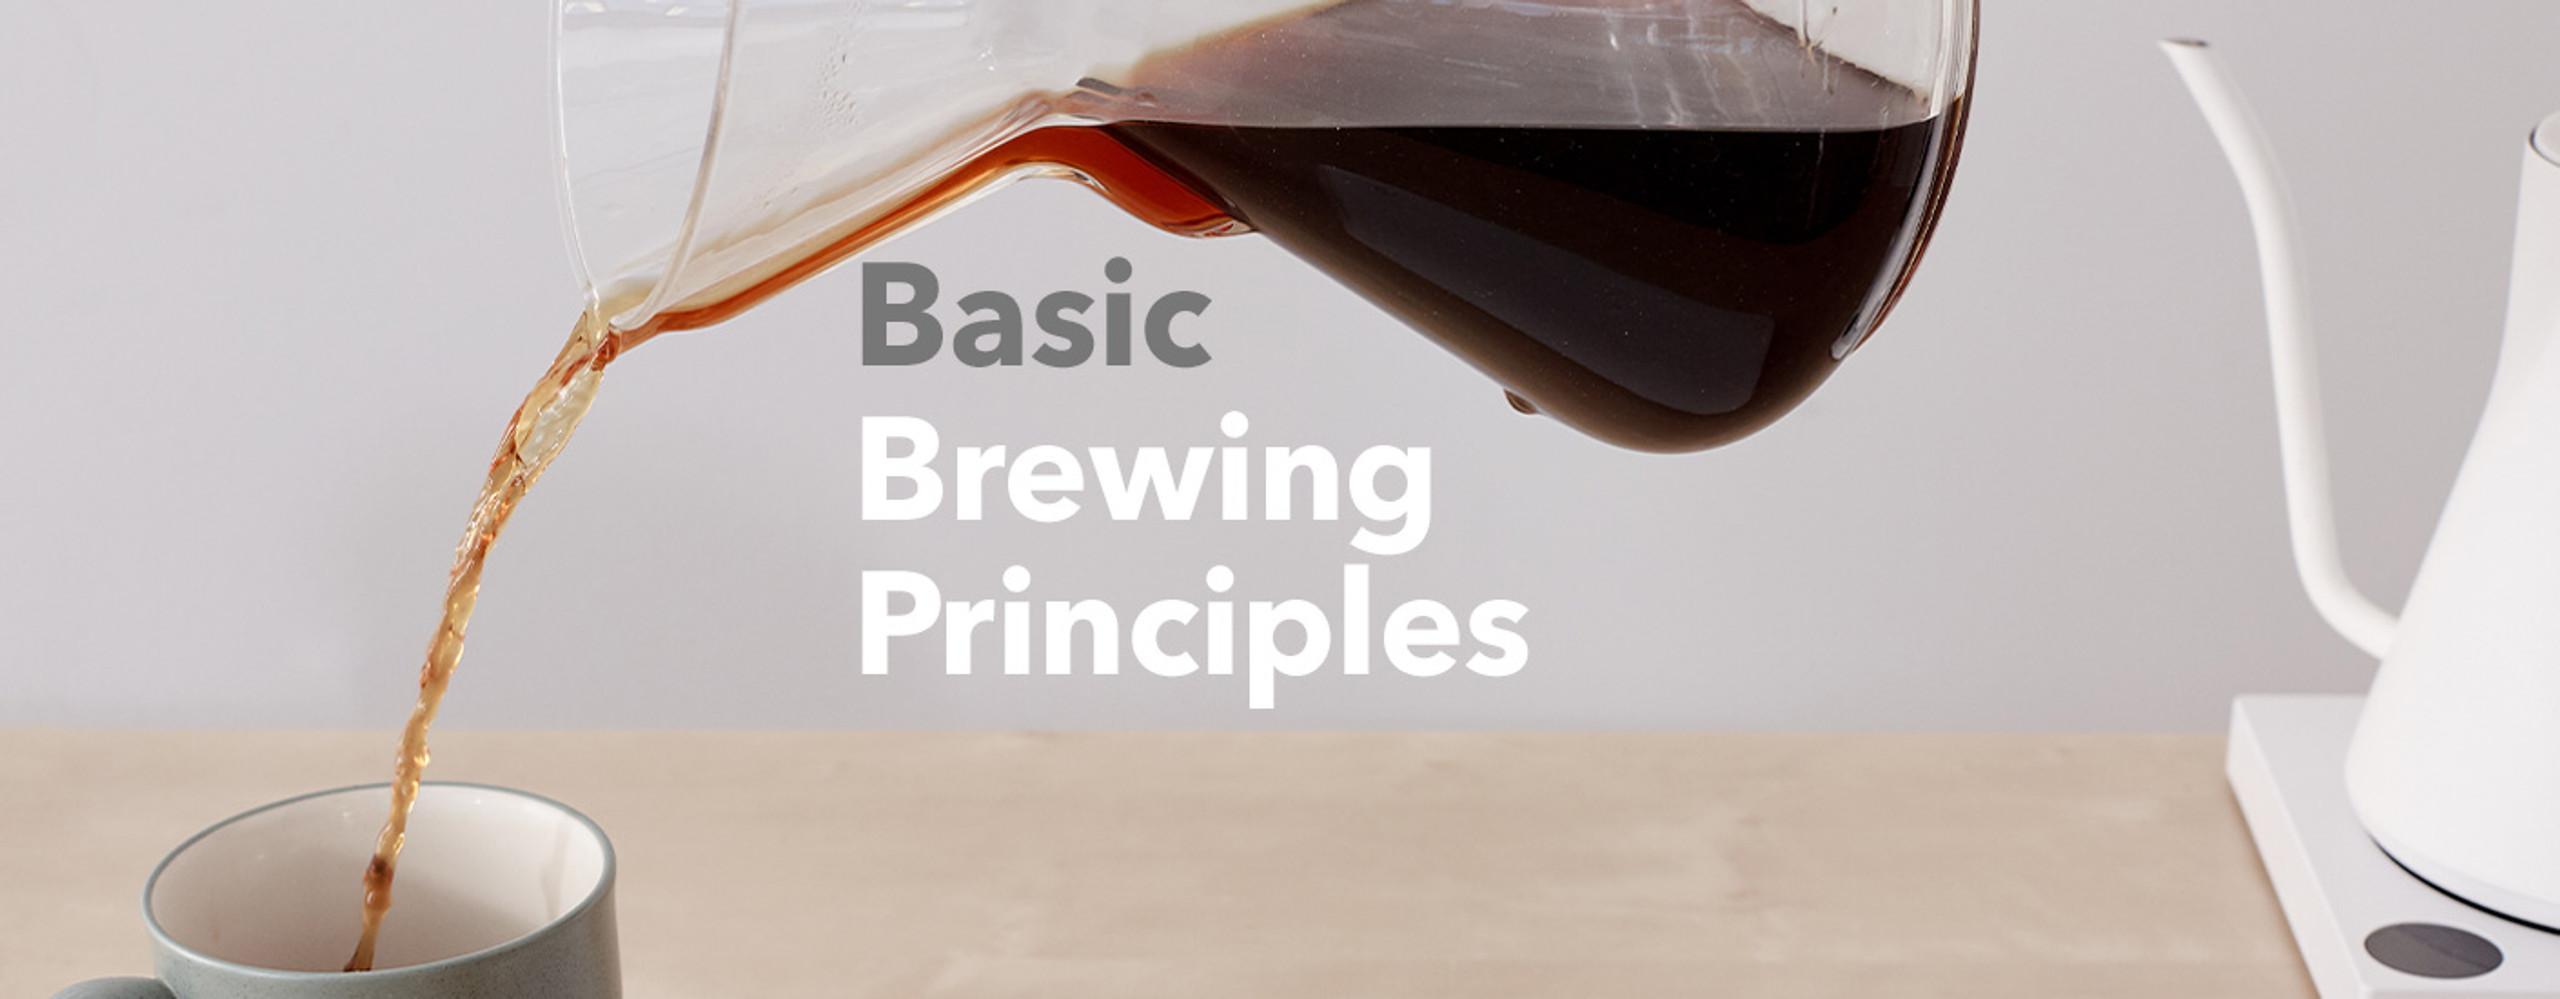 Basic Brewing Principles